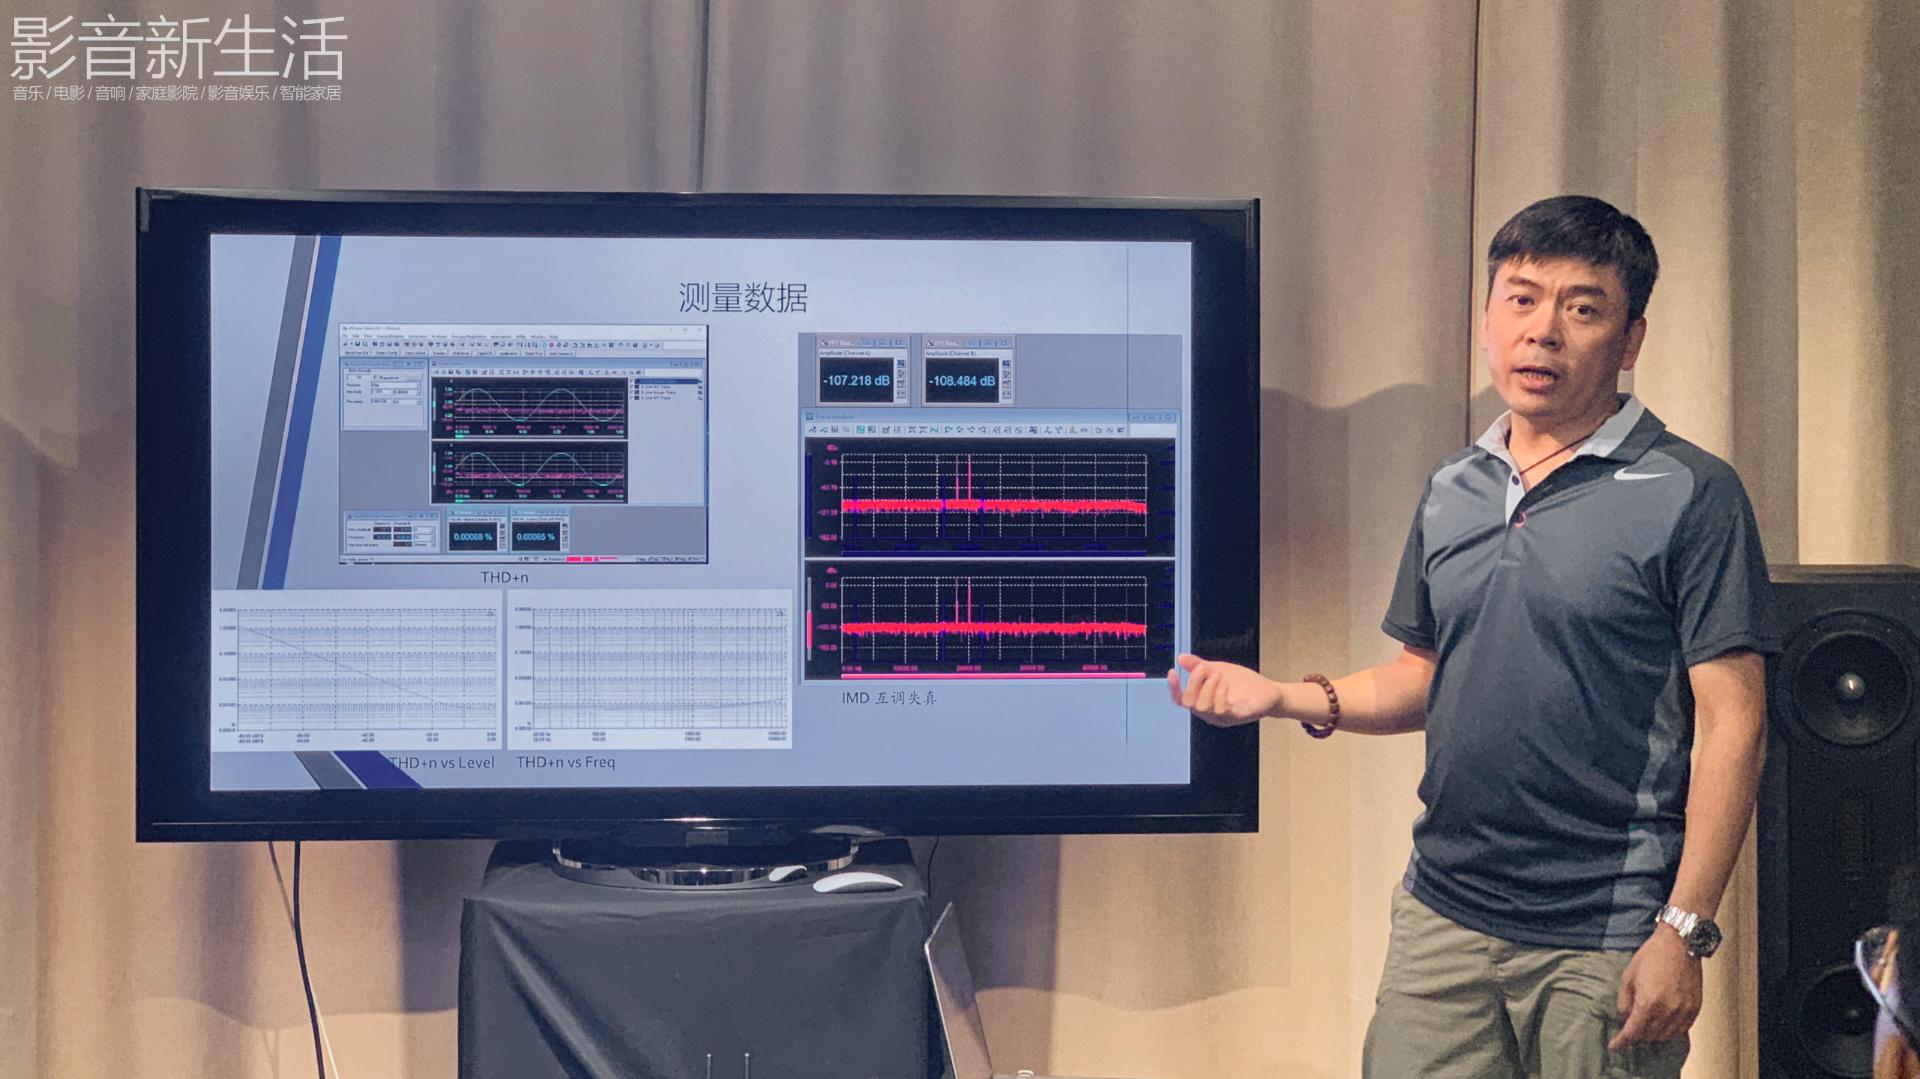 Pureaudio AirDSD HIFI 21 - 新品   2018柏韵10周年纪念产品:Pureaudio AirDSD音频流播放解码器发布!